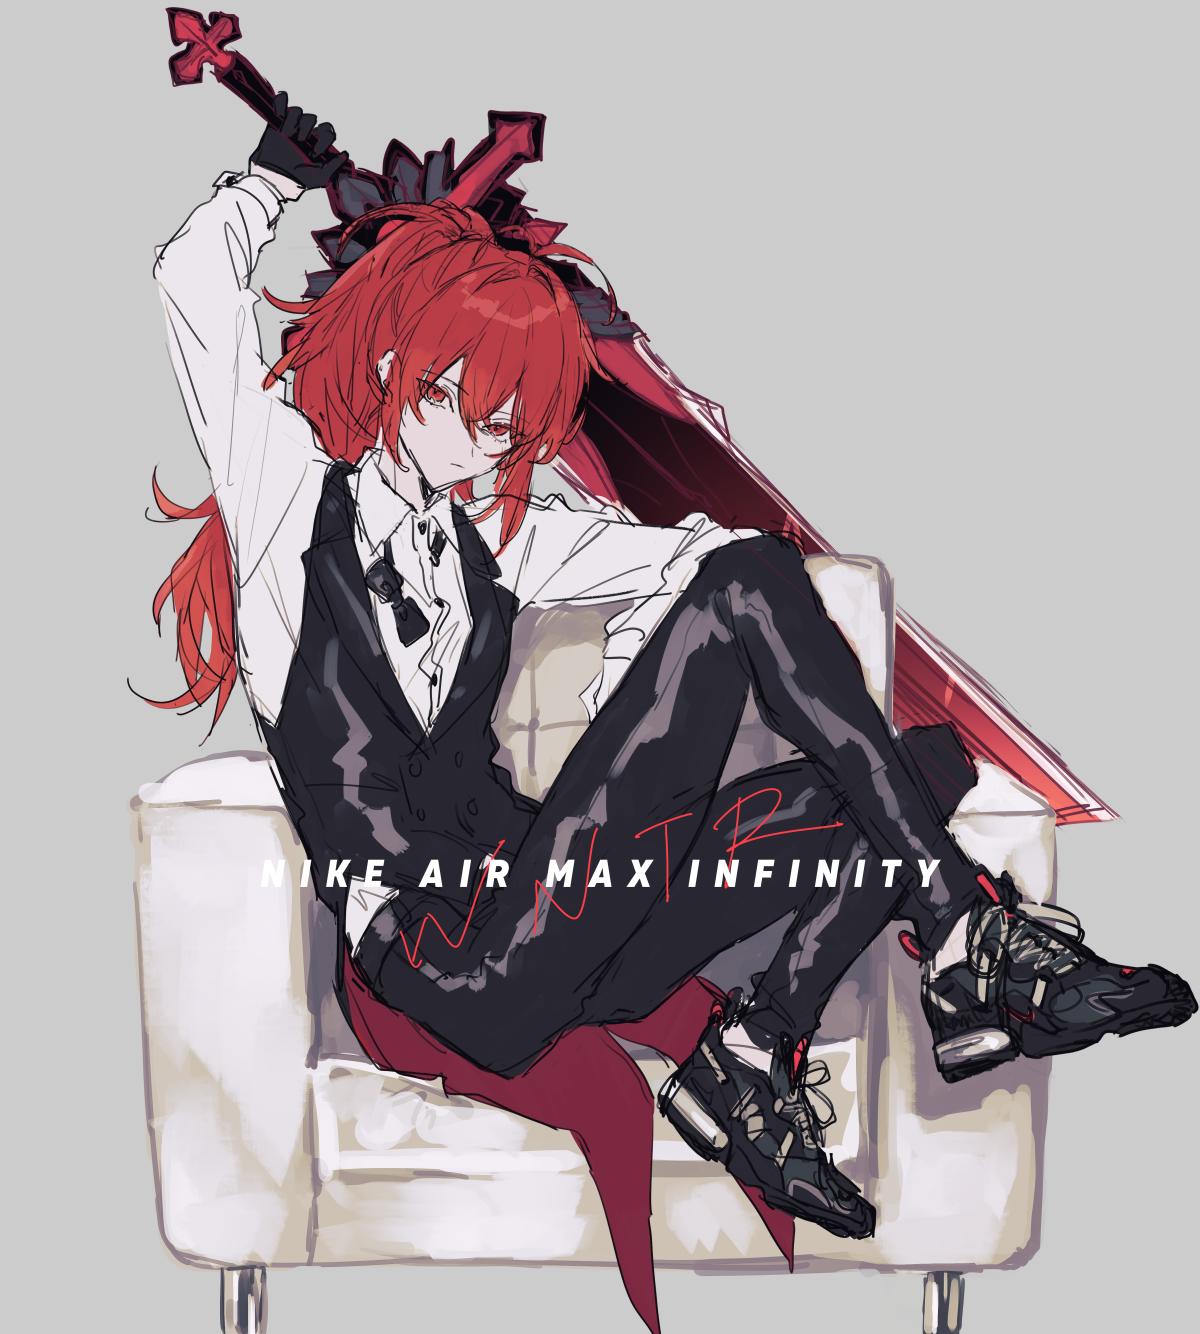 Anime 1200x1334 Genshin Impact Diluc (Genshin Impact) redhead